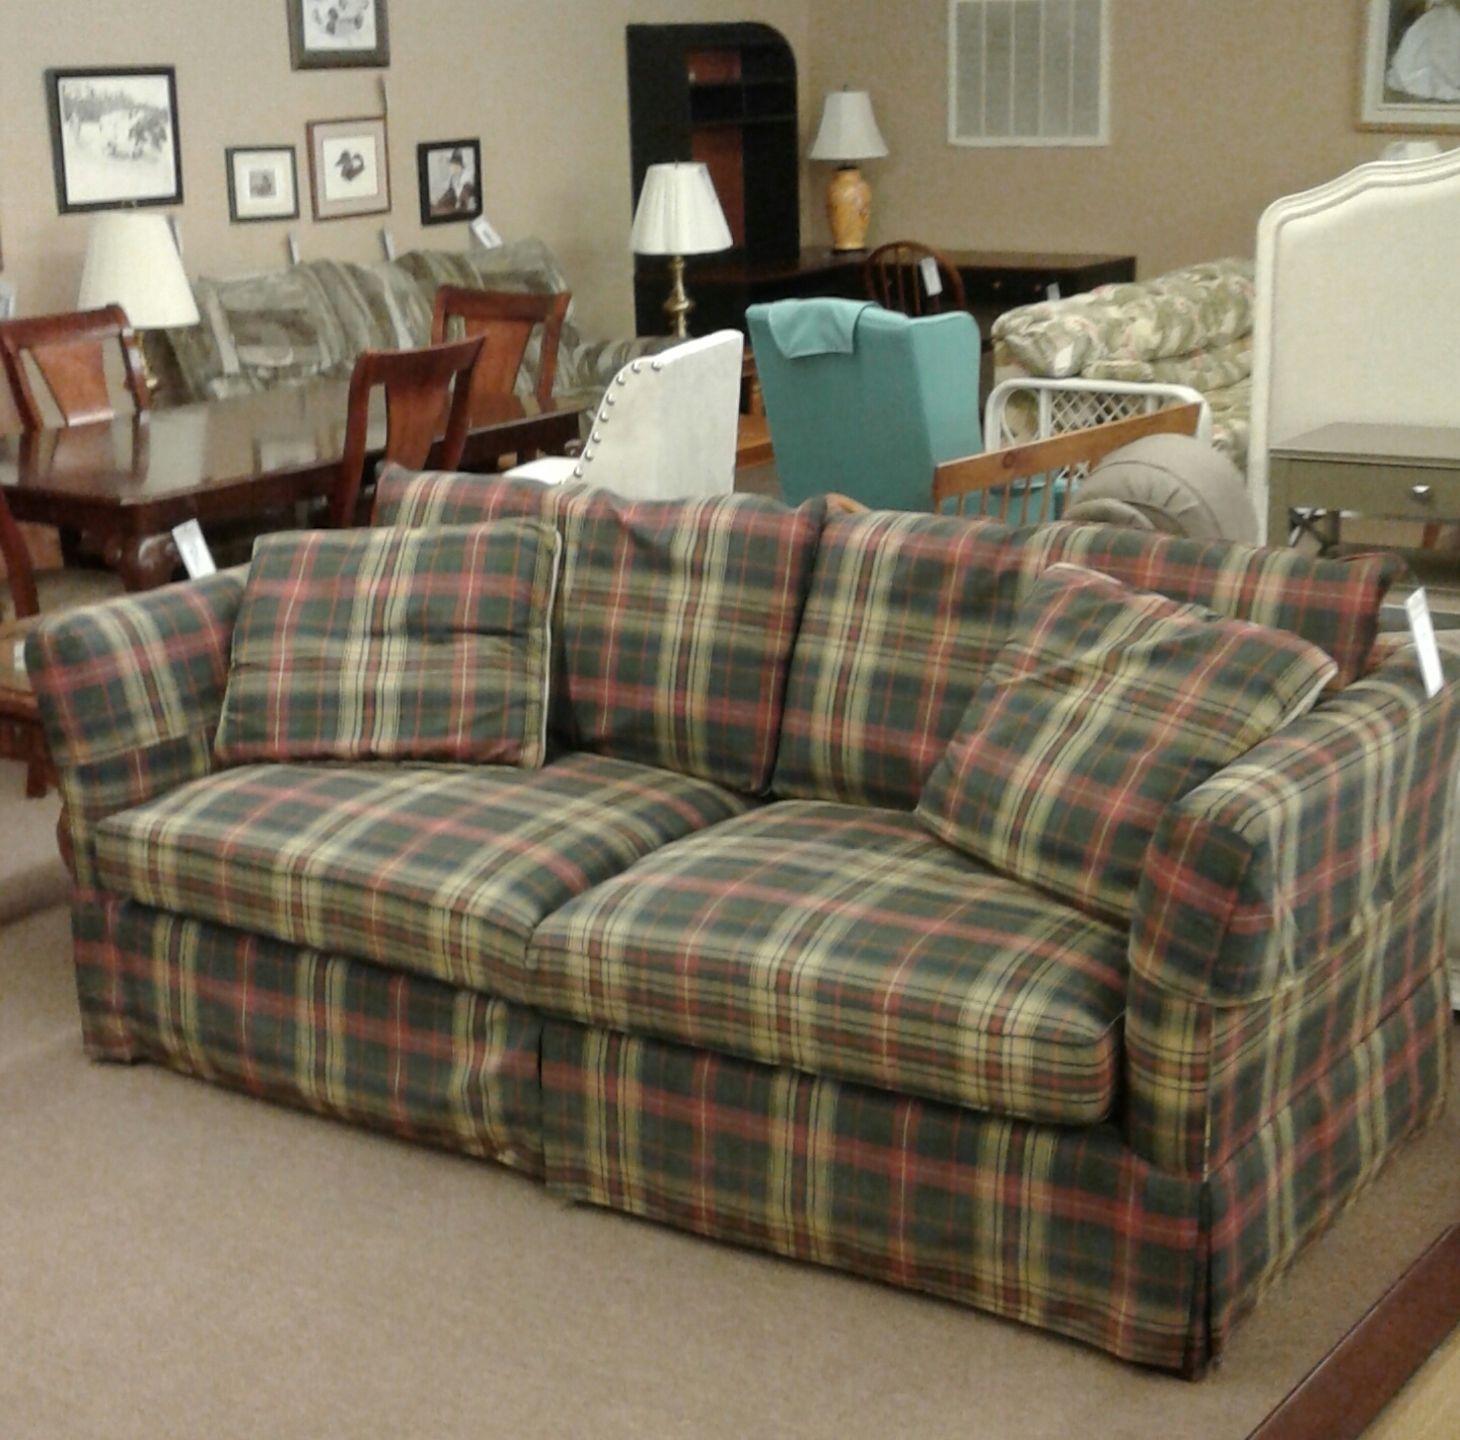 lexington plaid sofa delmarva furniture consignment. Black Bedroom Furniture Sets. Home Design Ideas